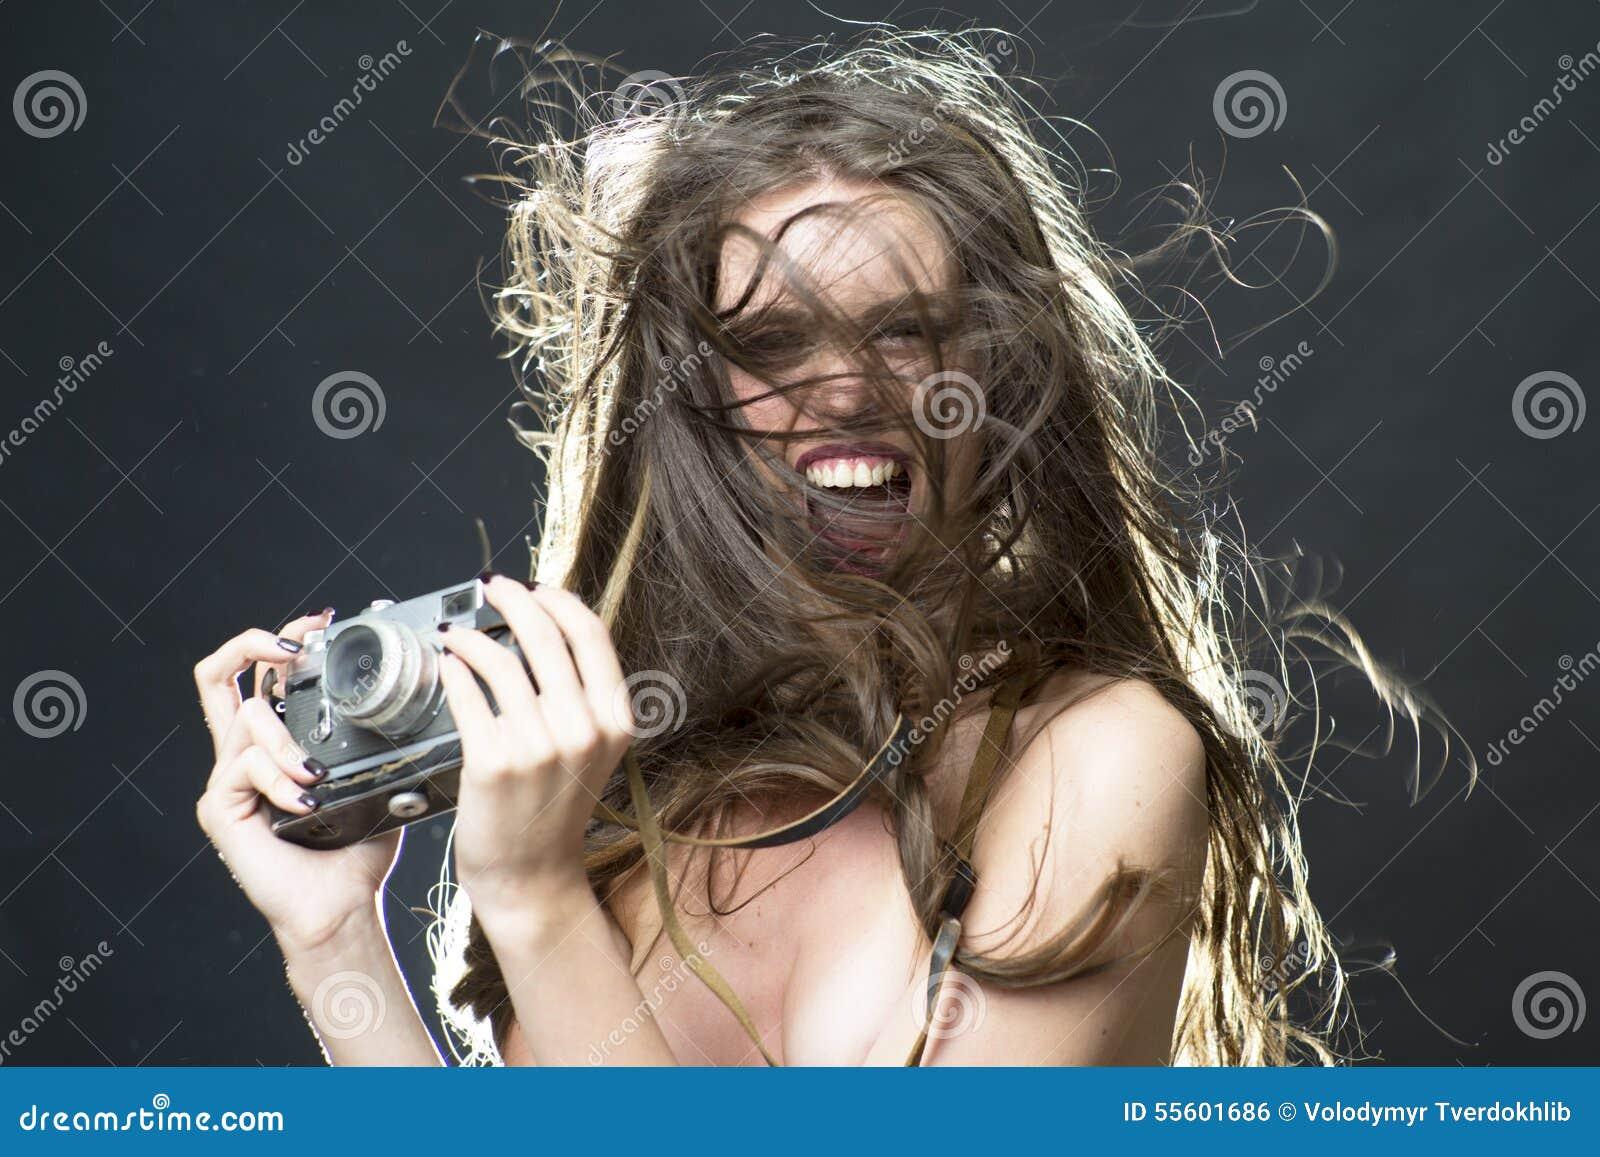 London irish girls naked